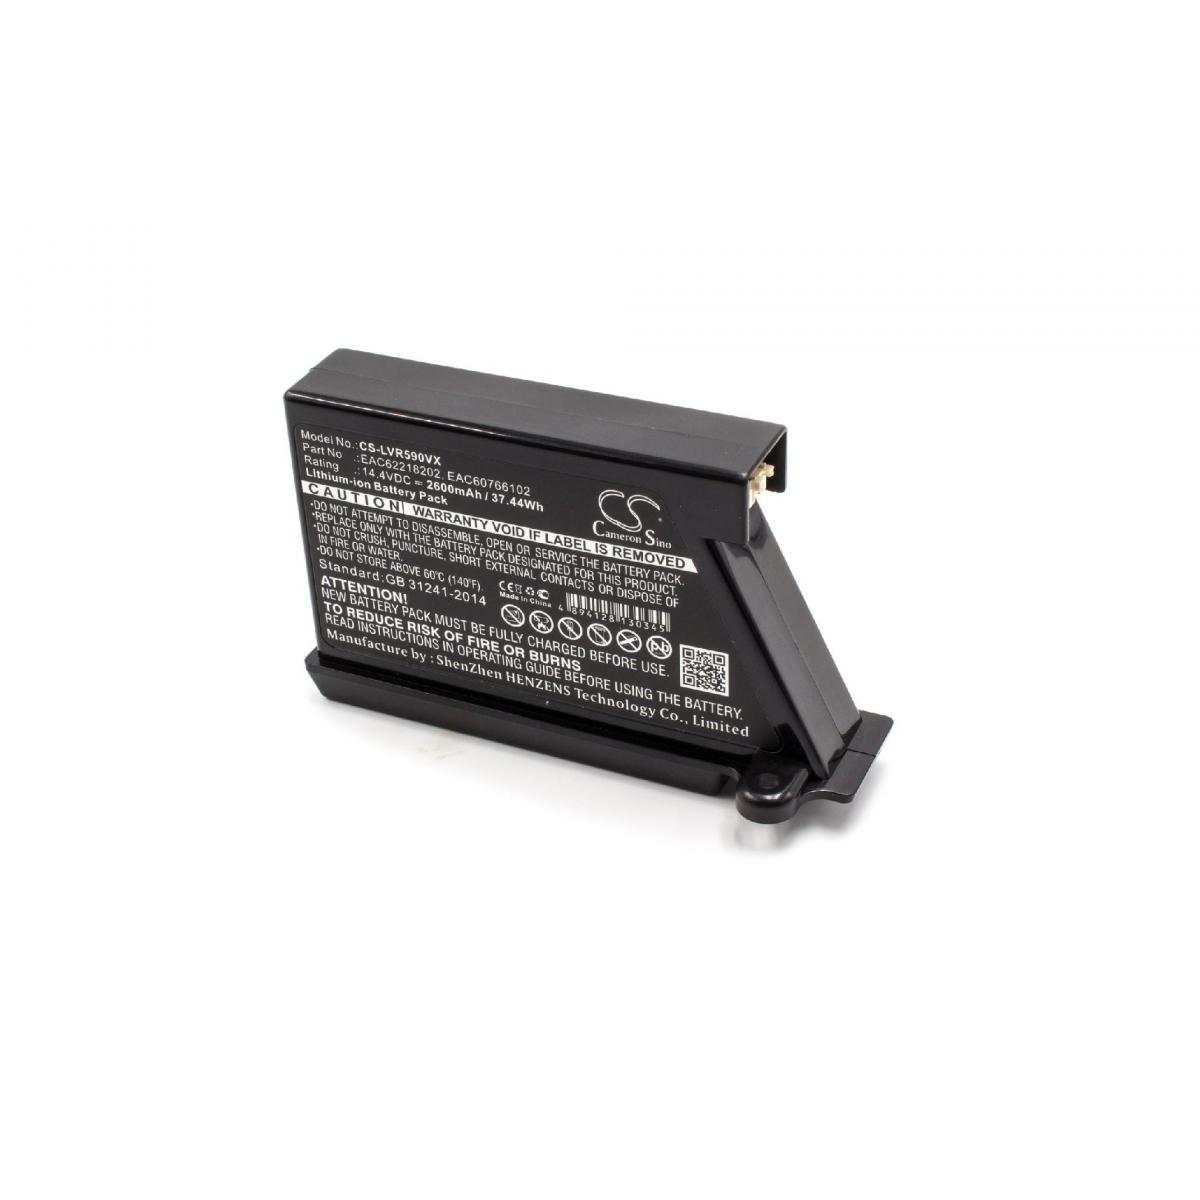 Vhbw vhbw Batterie compatible avec LG HOM-BOT VR64701LVM, VR64702LVMP, VR65502LV robot électroménager (2600mAh, 14,4V, Li-ion